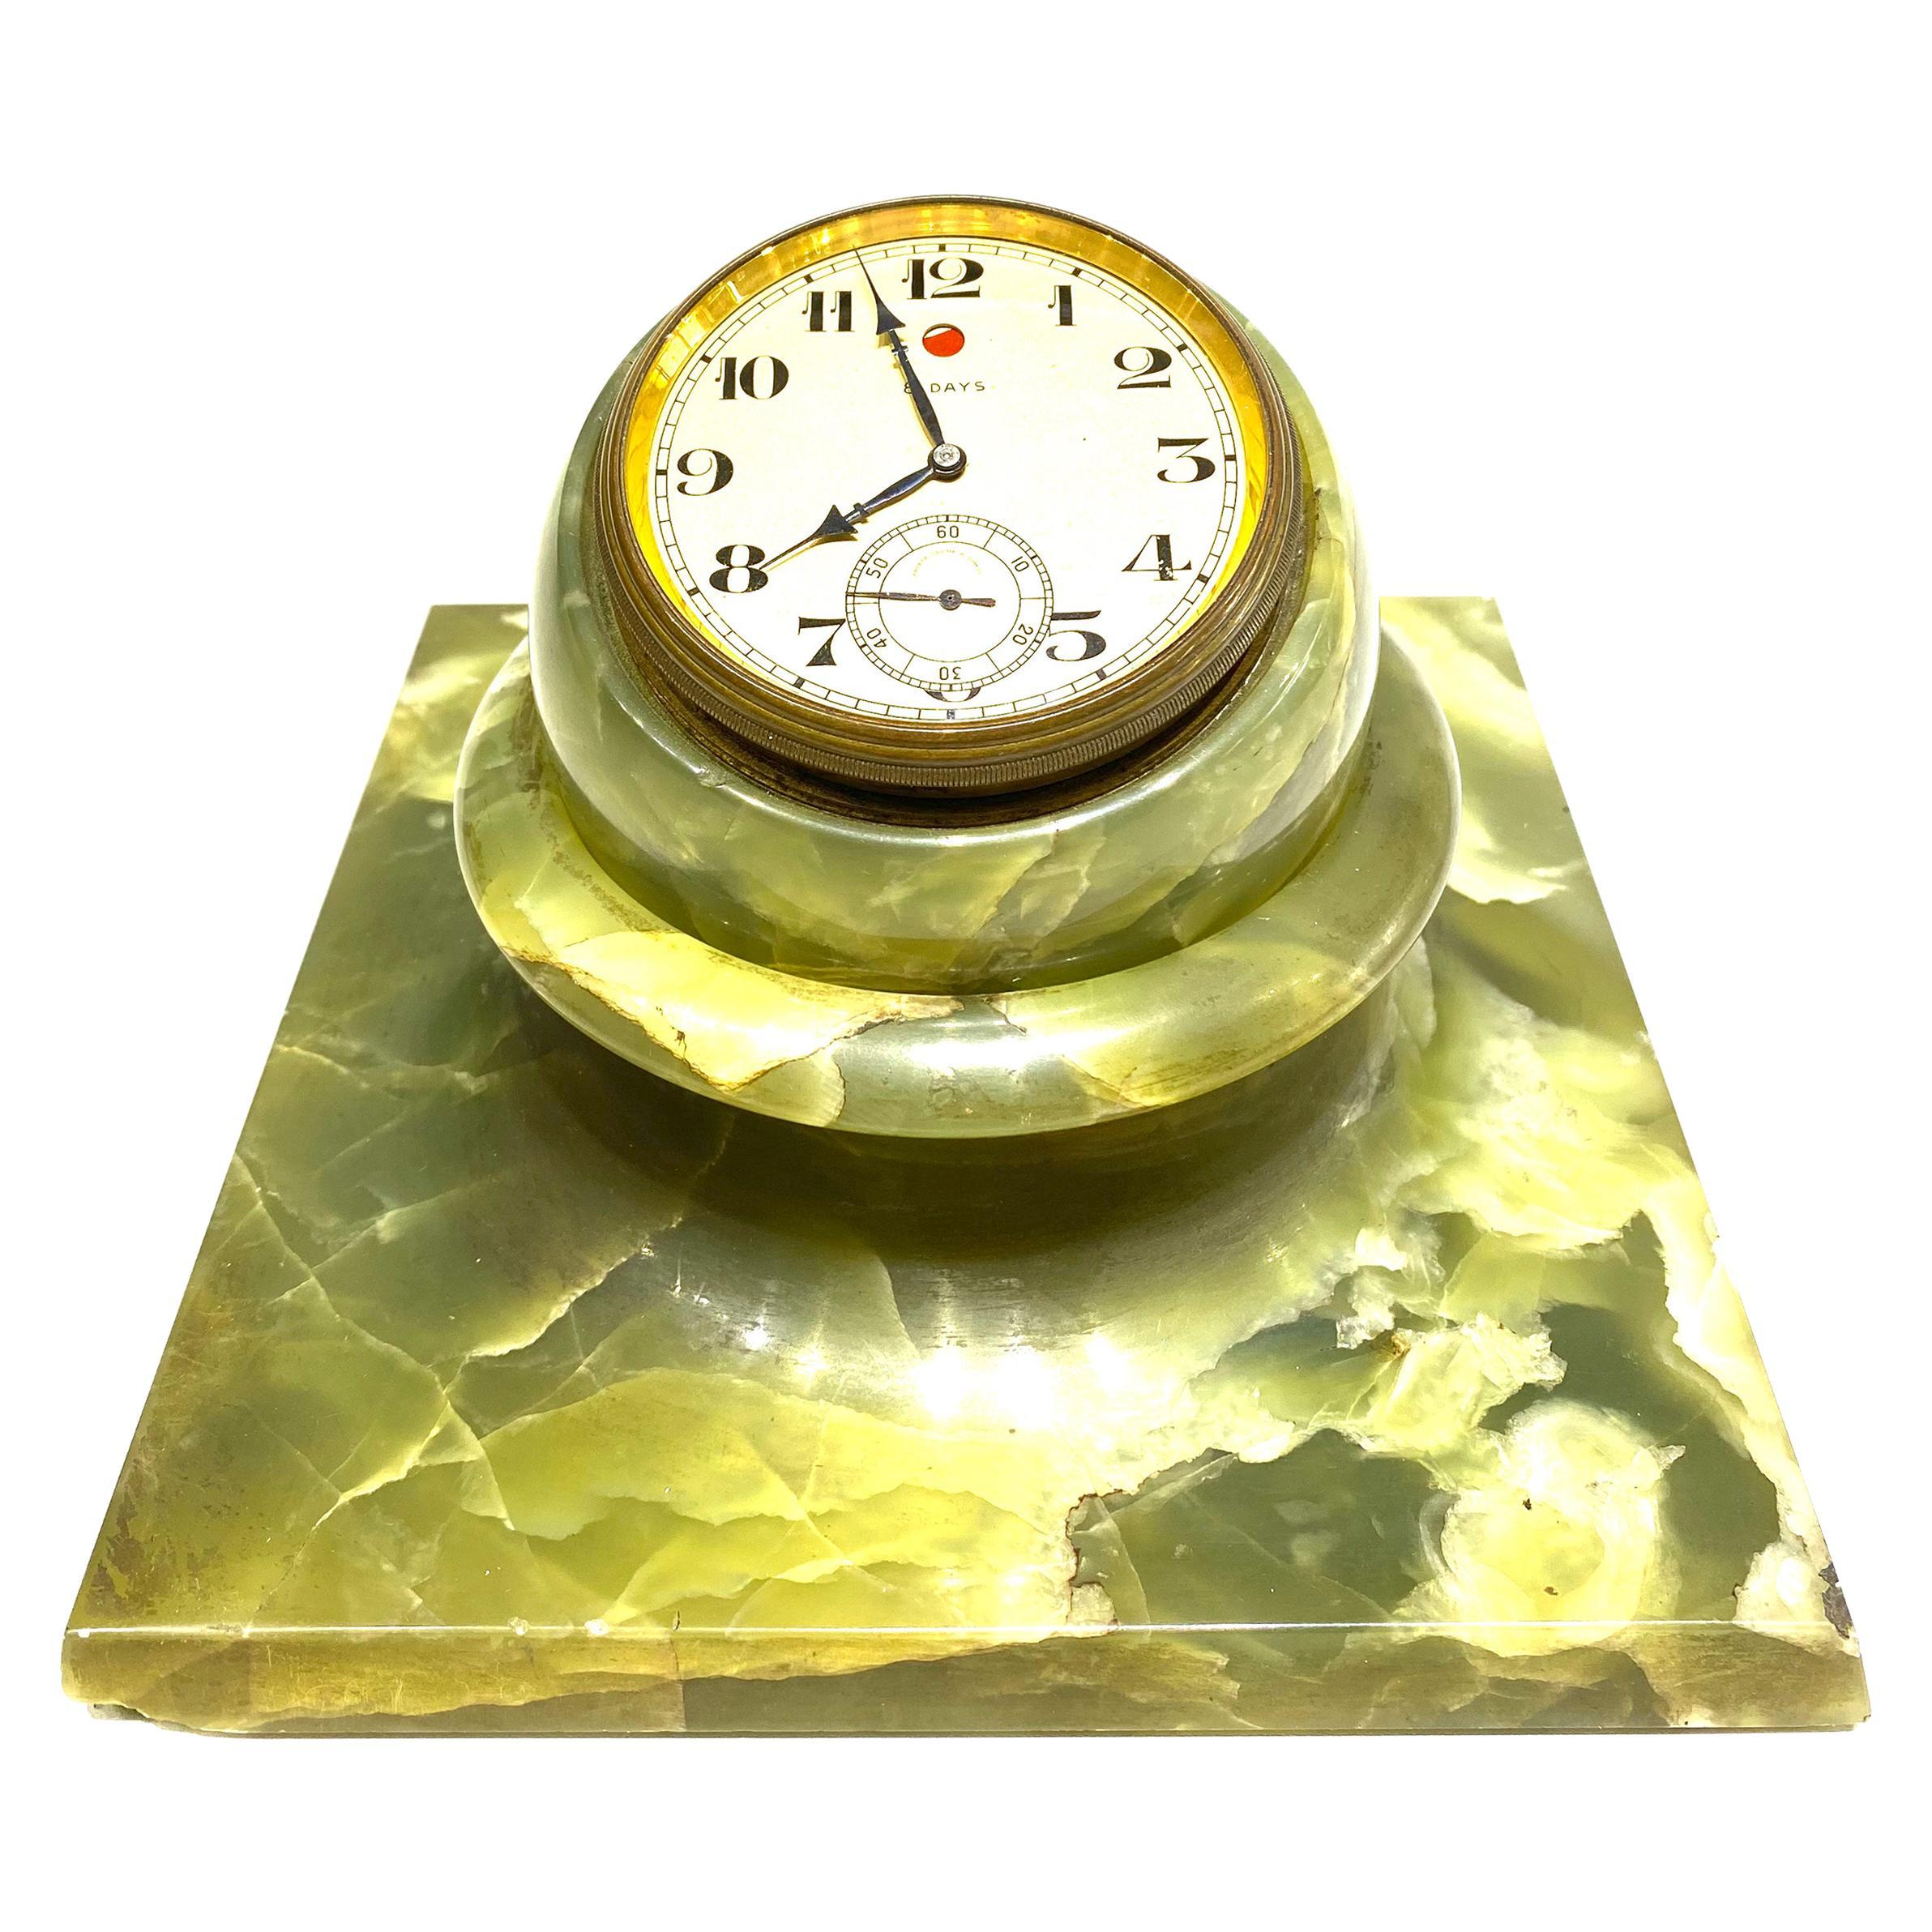 1950s Shreve, Crump & Low Co. Green Onyx Table Clock